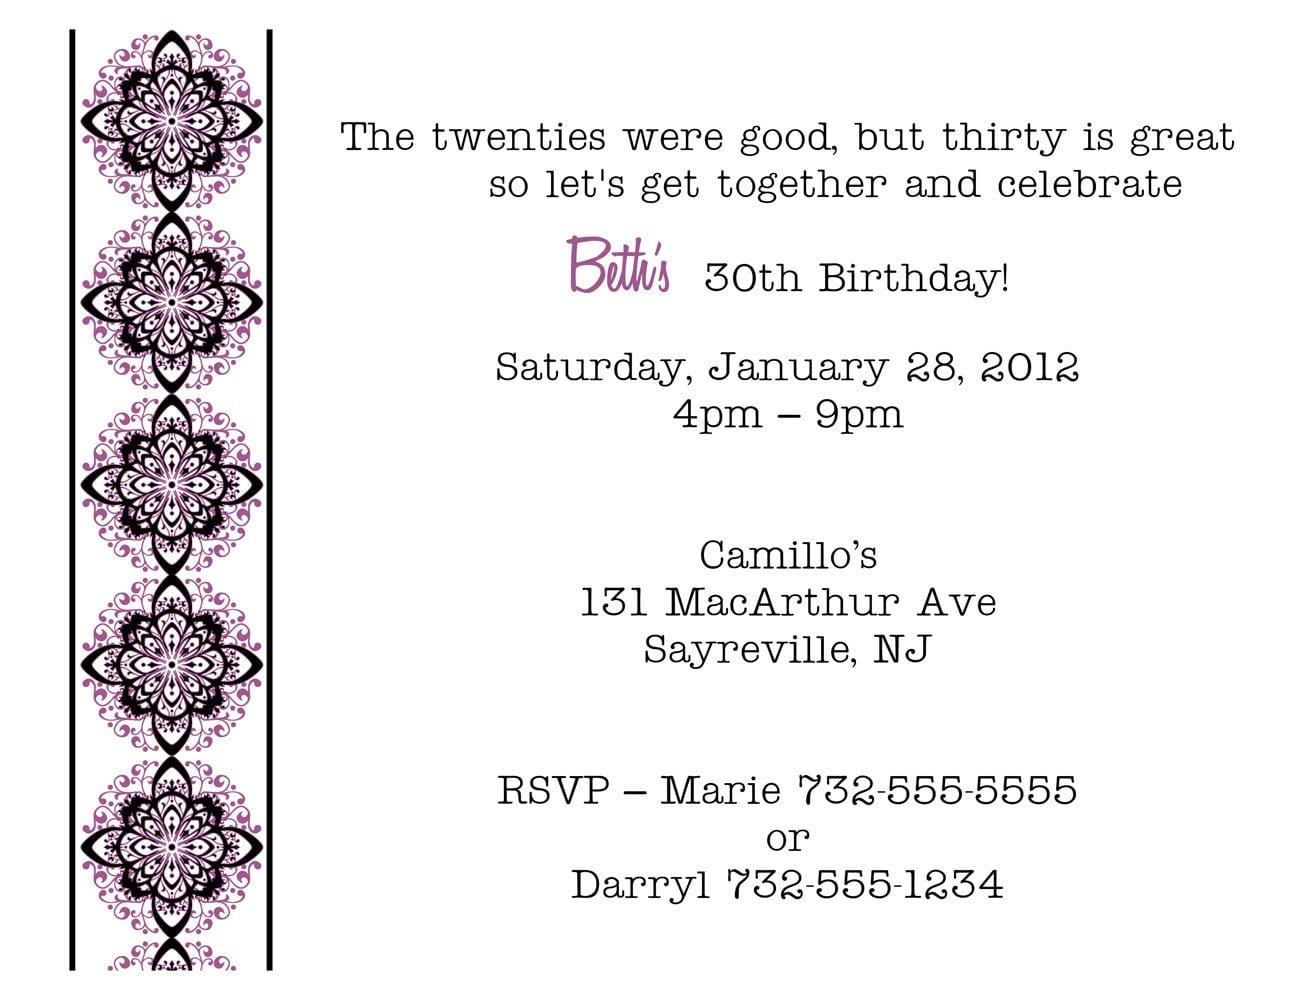 Birthday Invitation Text Message For Friends | Invitationswedd.org